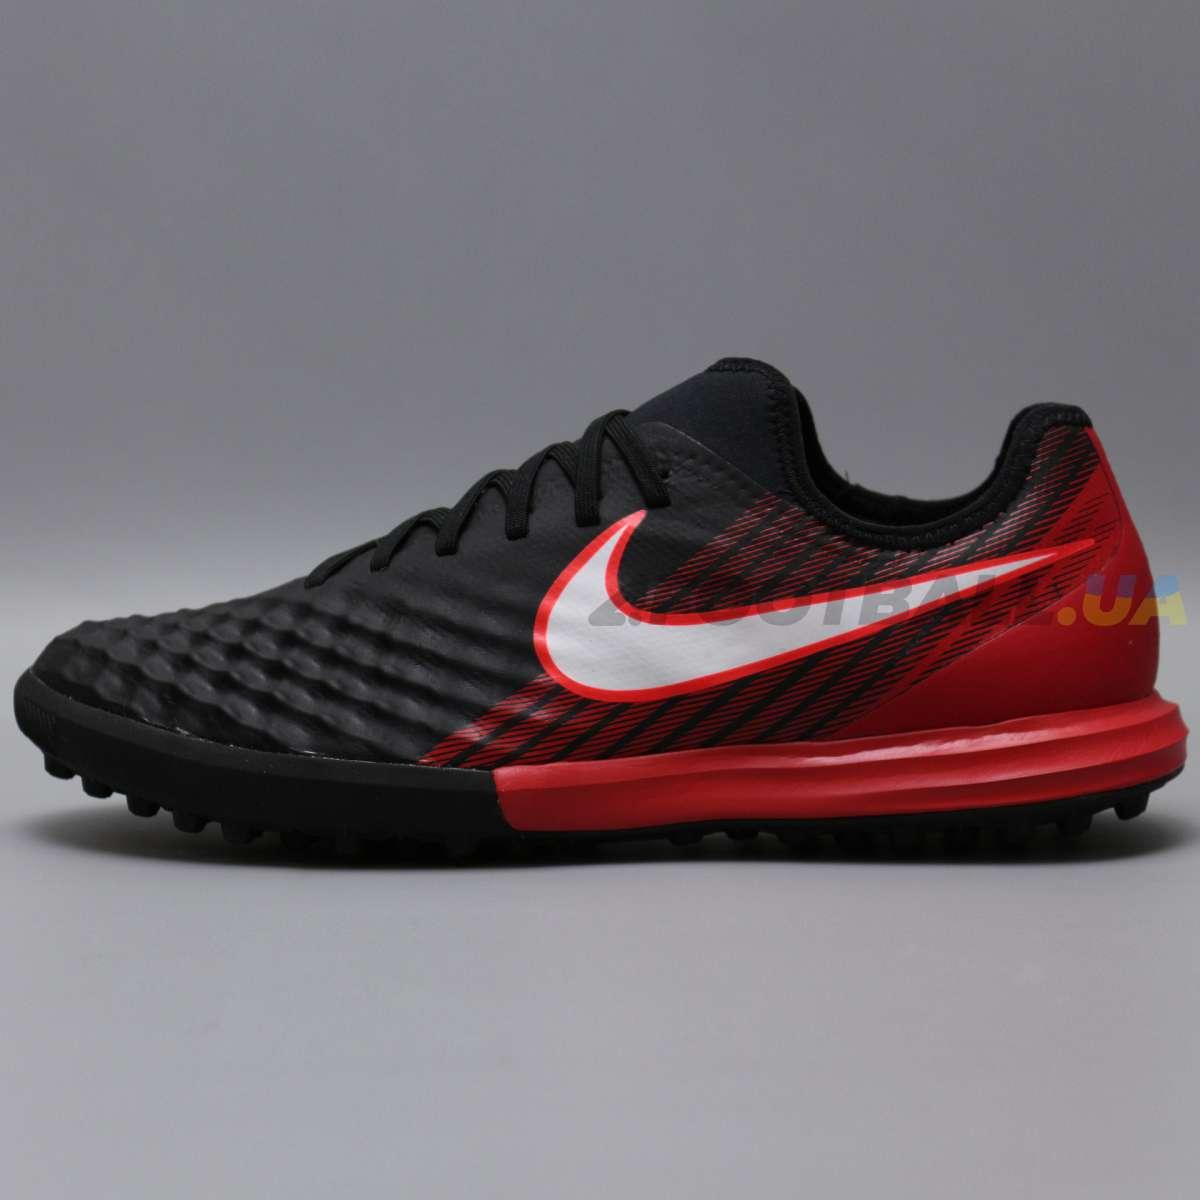 636354b4 Сороконожки NIKE MAGISTAX FINALE II TF 844446-061 black-red купить ...